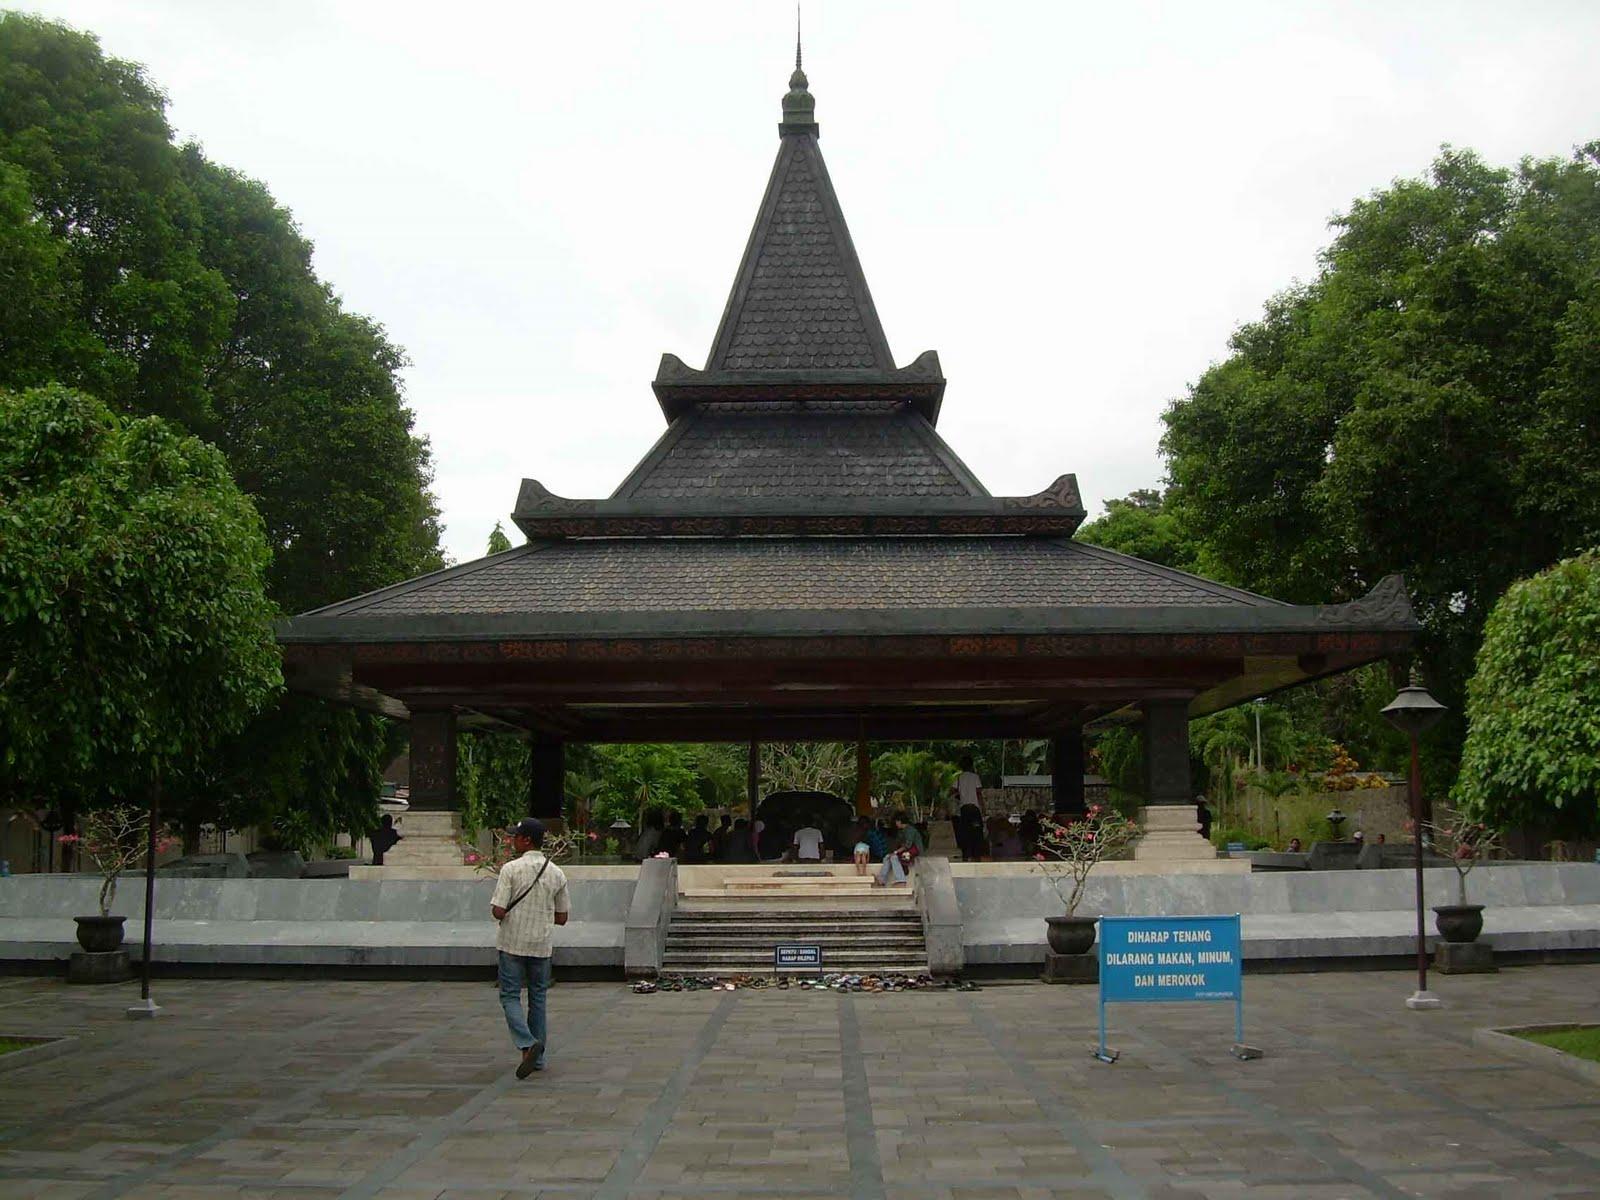 Biro Wisata Fortekindo Tour Makam Bung Karno Blitar Jatim Kota